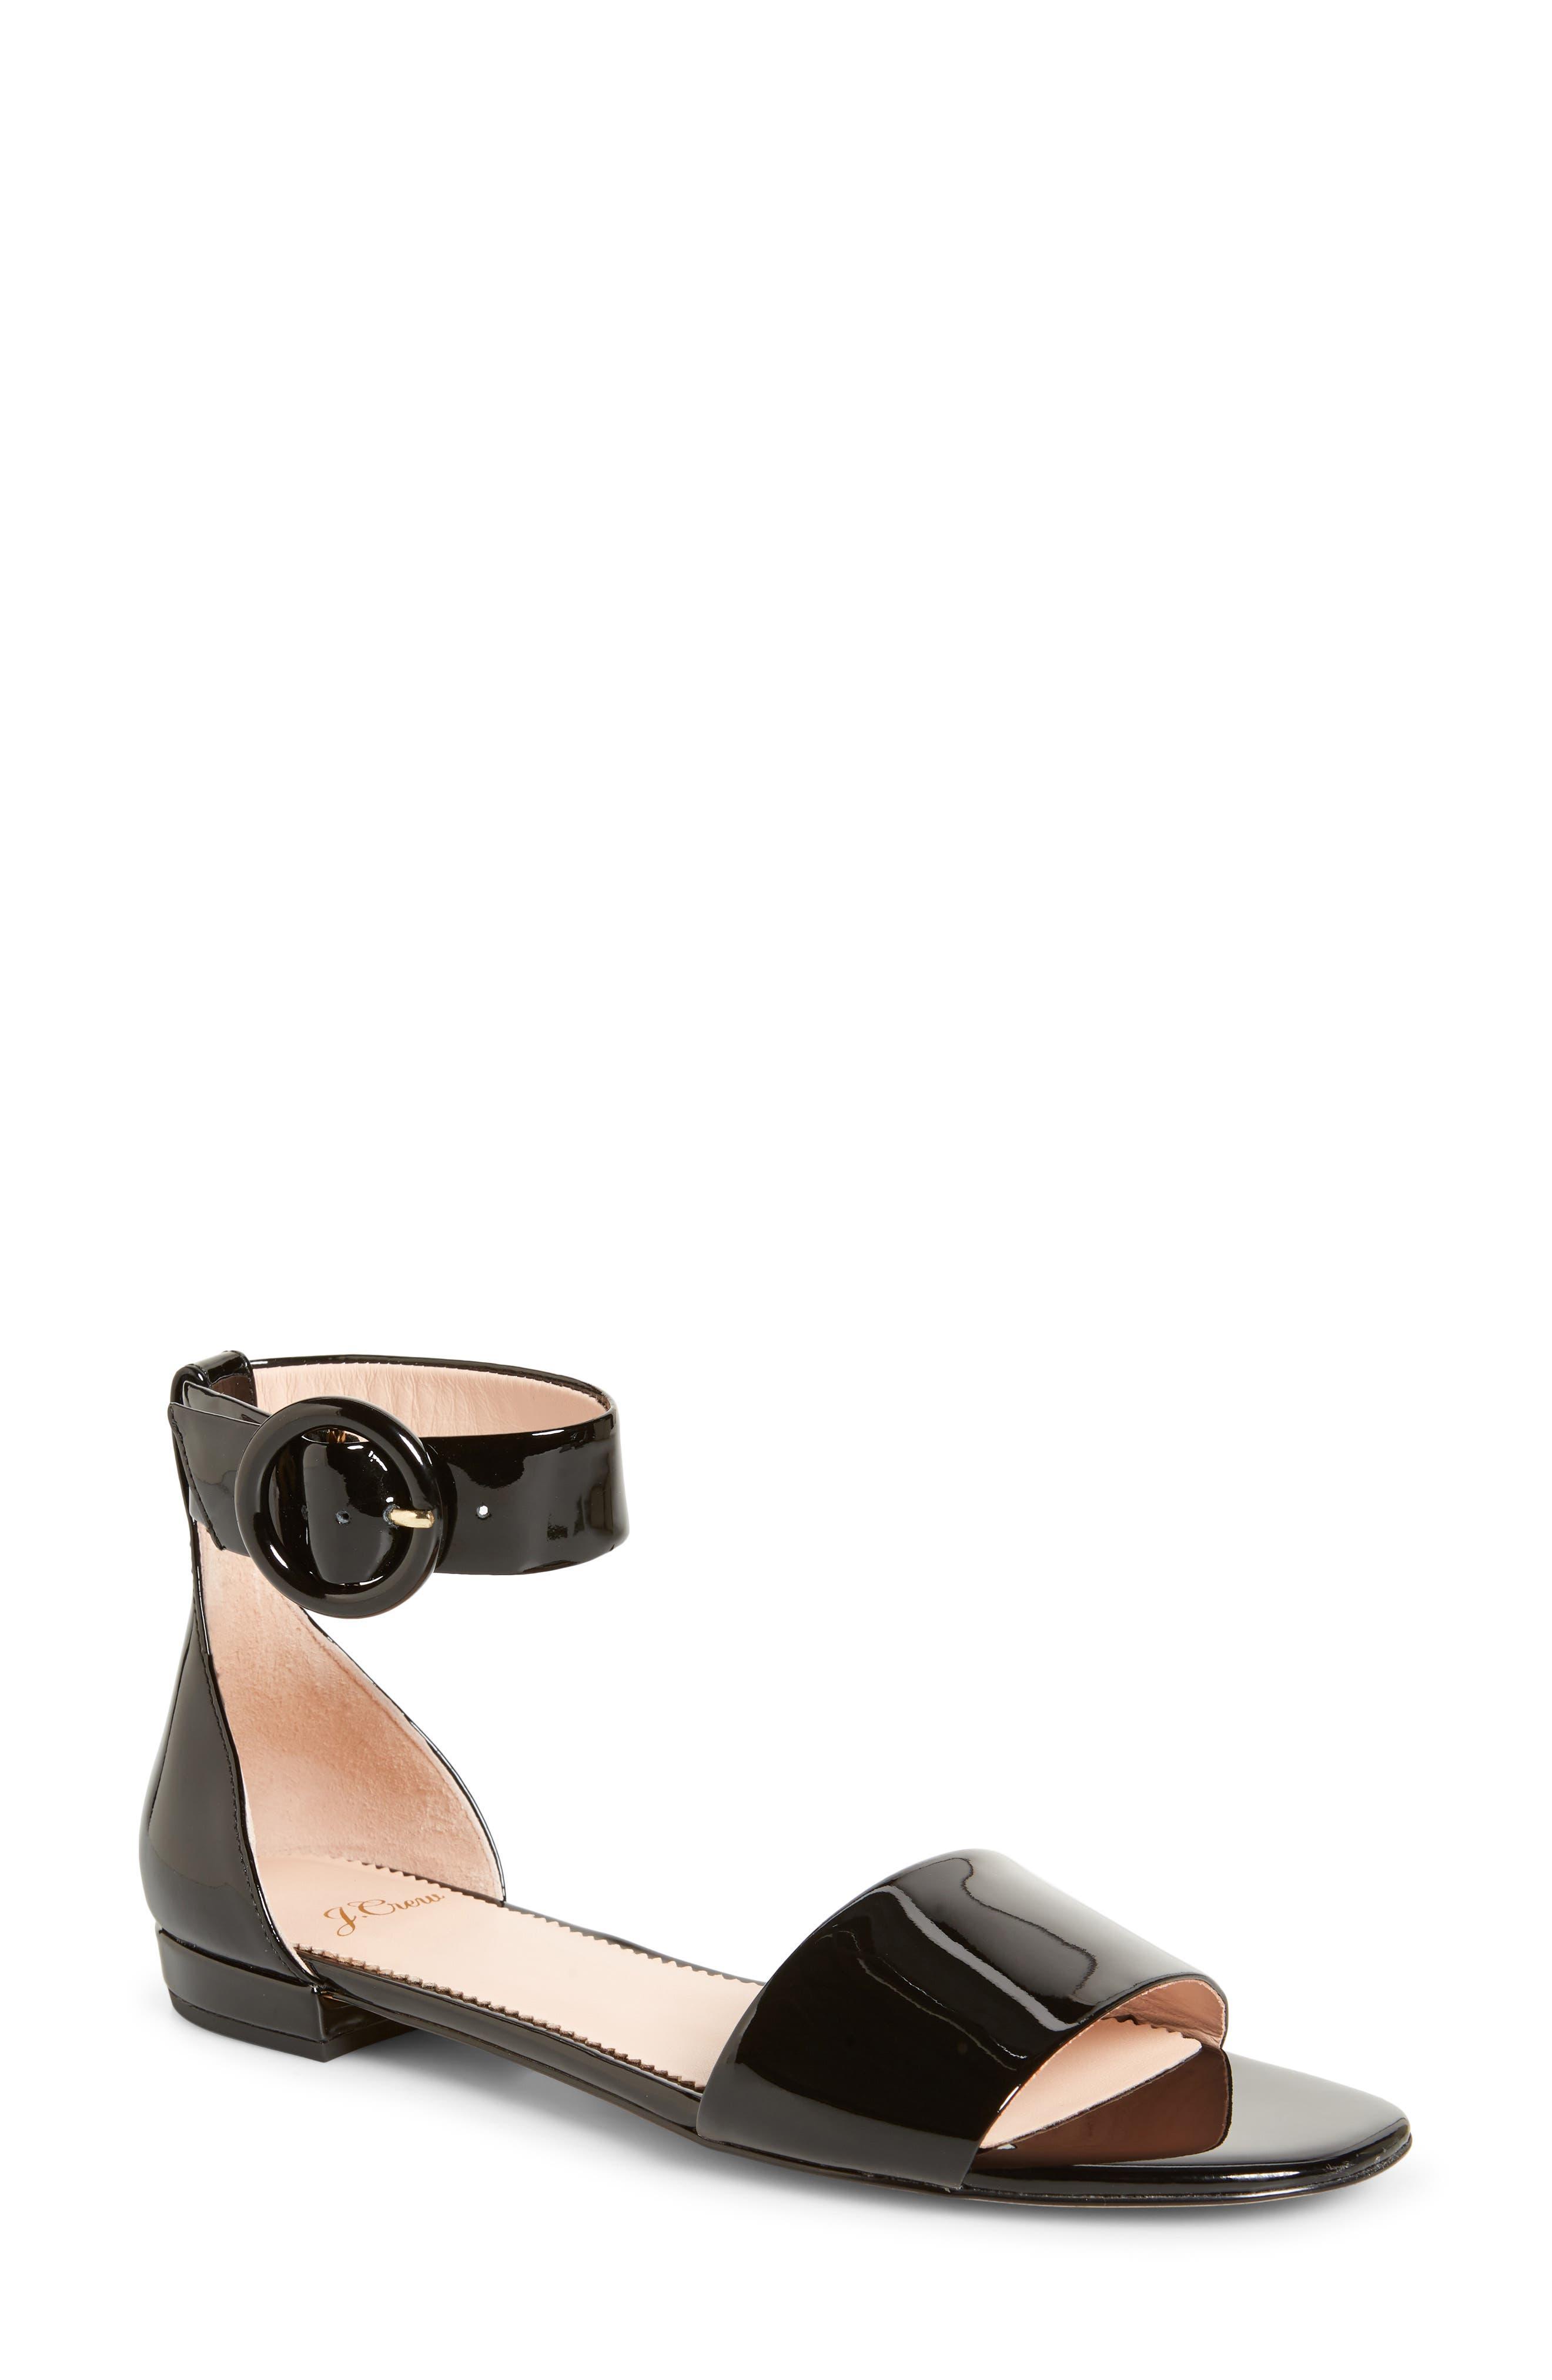 Ankle Strap Flat Sandal, Main, color, 001